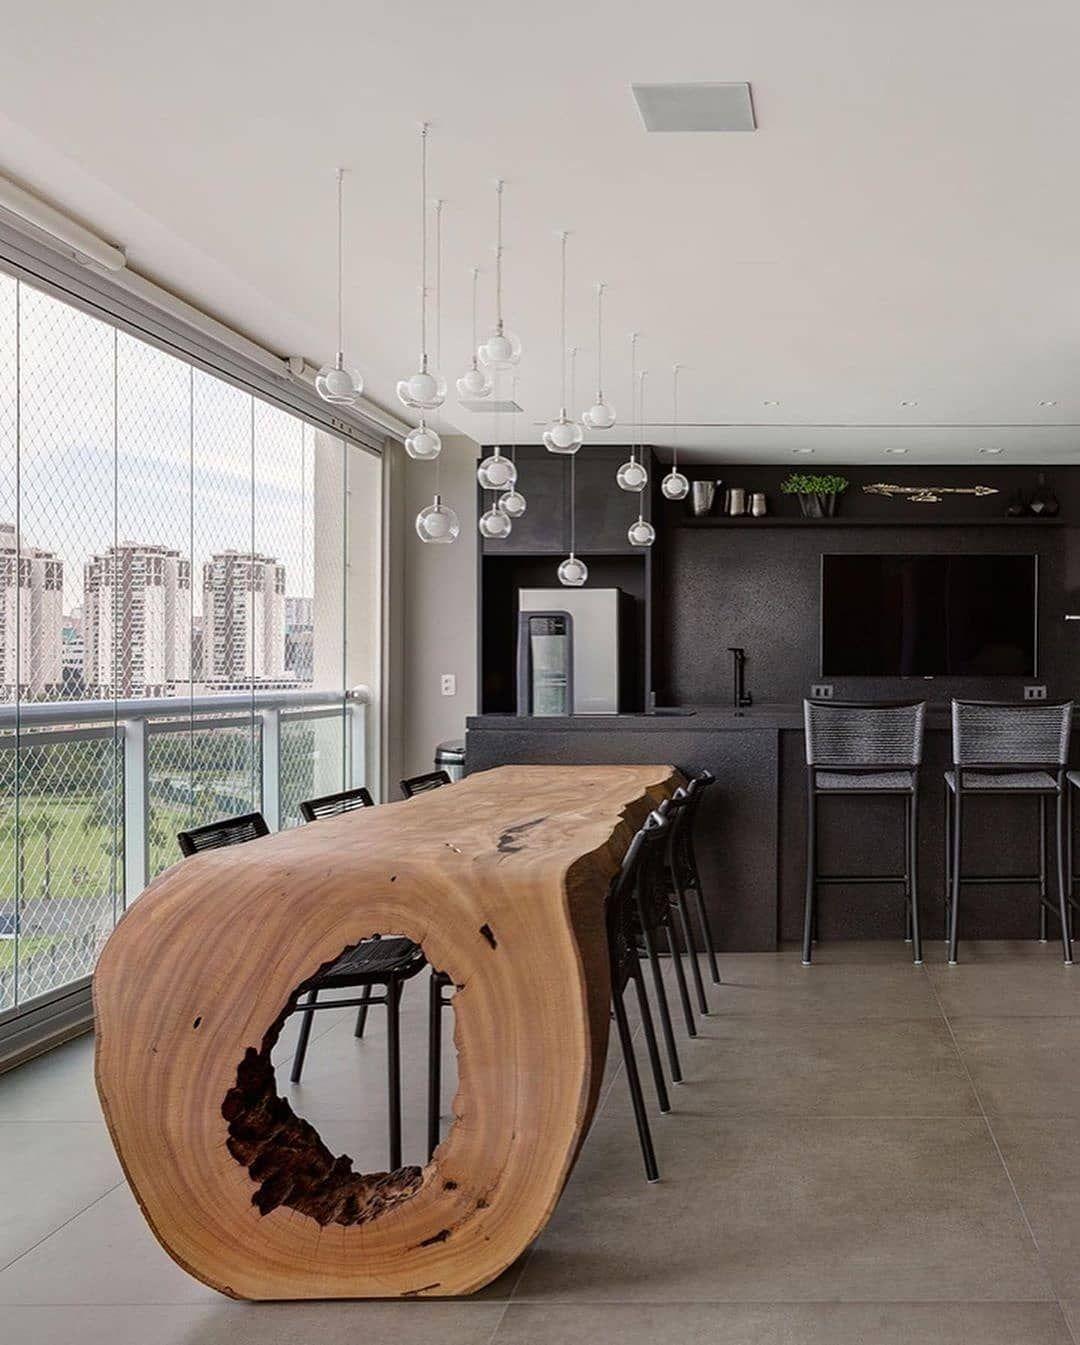 Villa Maison De Luxe Manoir En 2020 Interieur Maison Design Deco Maison Interieur Interieur Maison